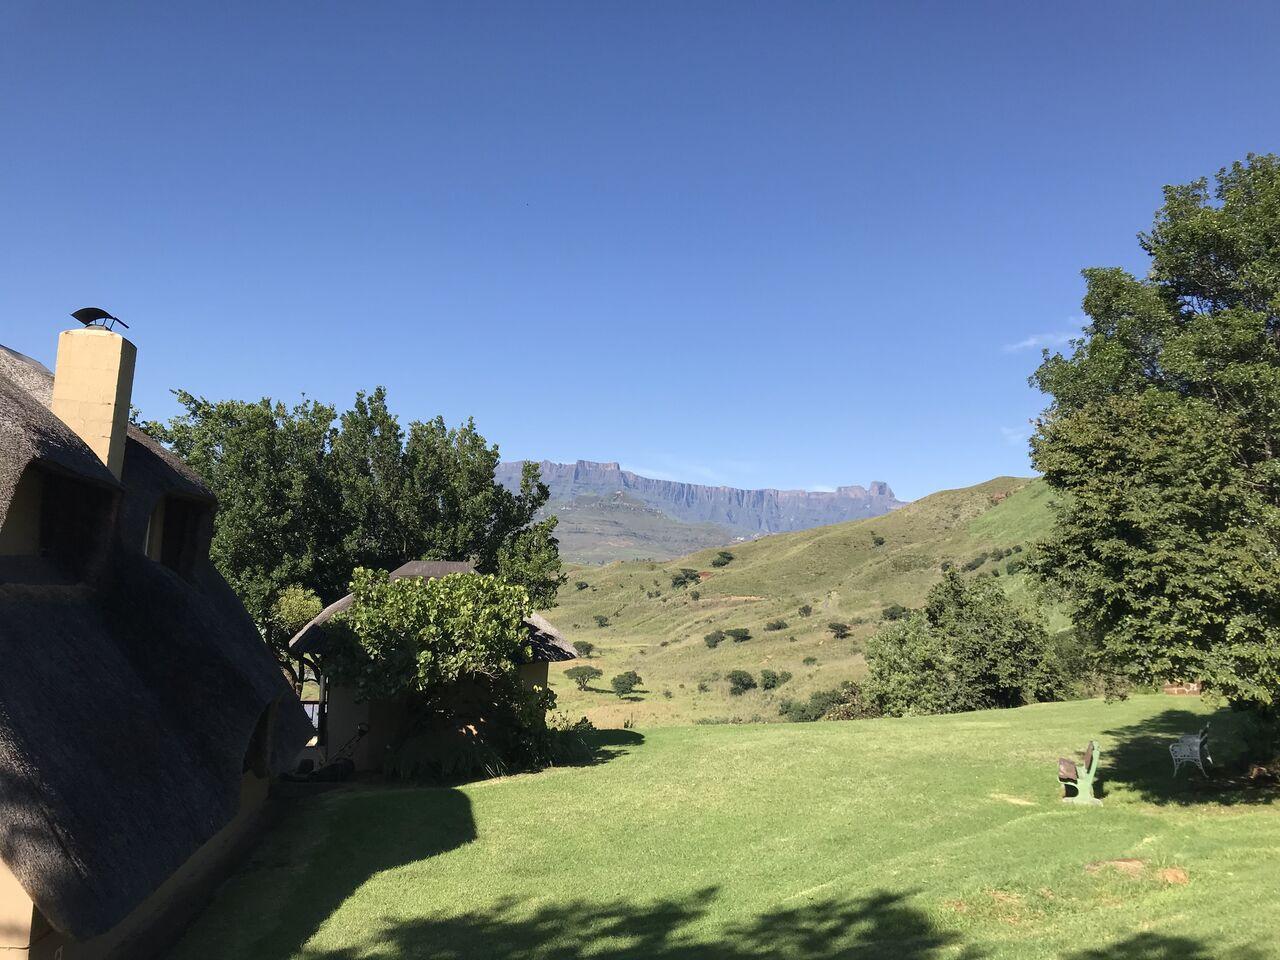 Hlalanathi -04 and 9 view